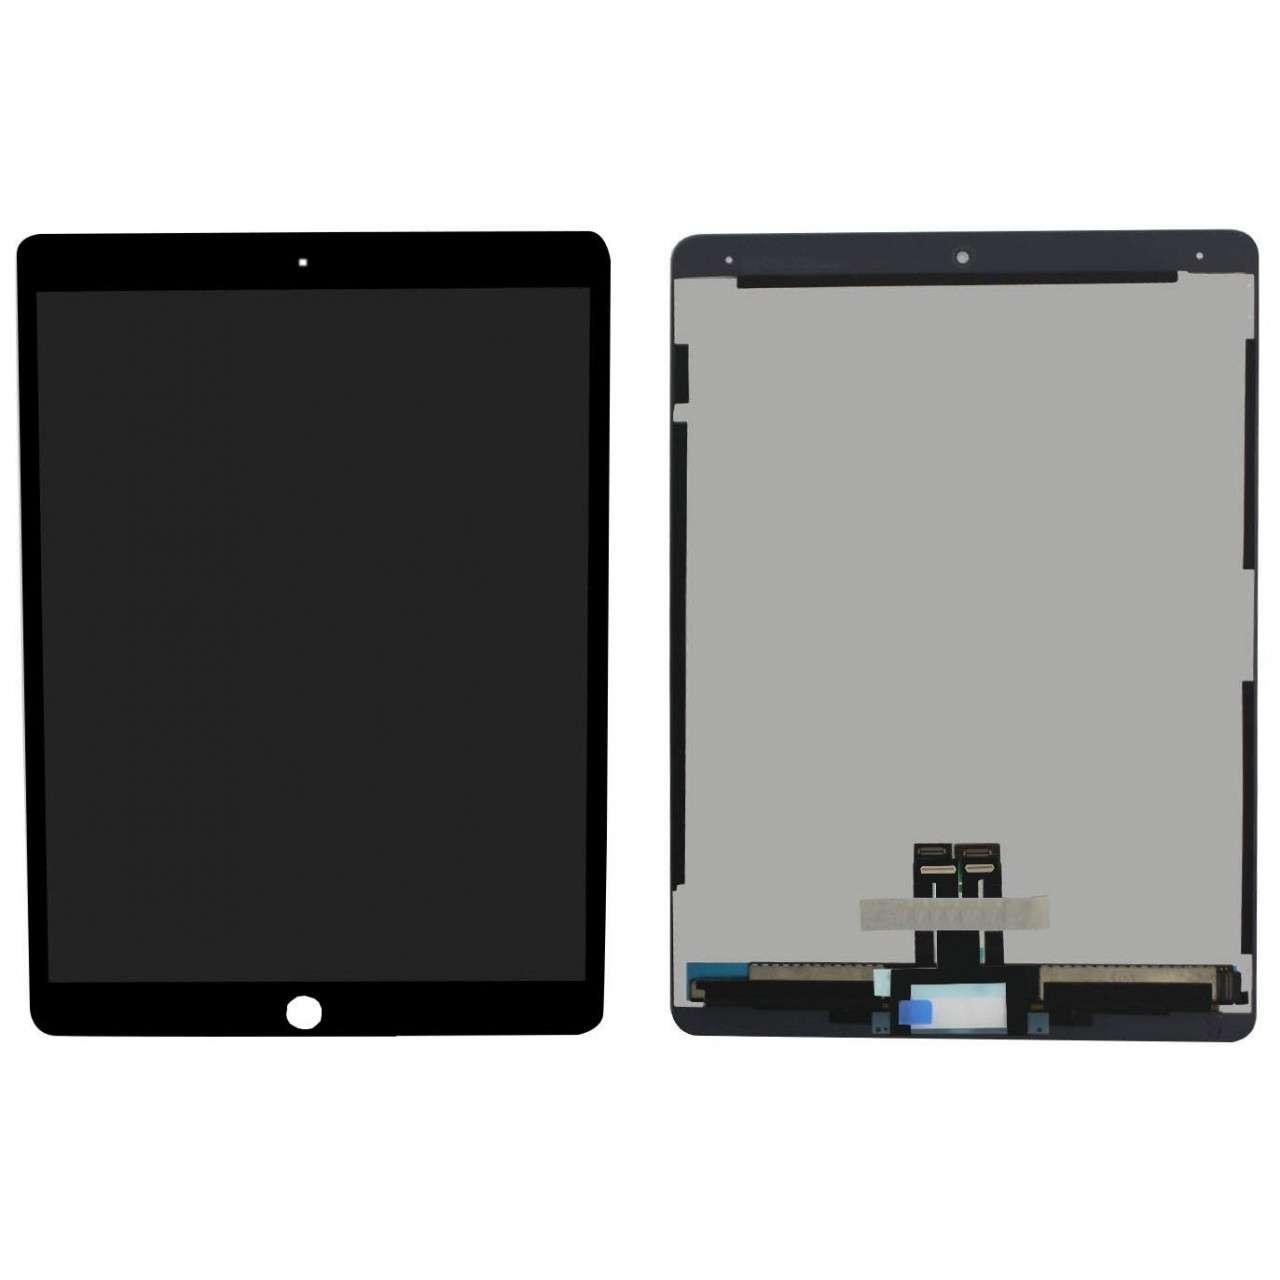 Ansamblu LCD Display Touchscreen Apple iPad Pro 10.5 2017 A1709 LTE Negru imagine powerlaptop.ro 2021